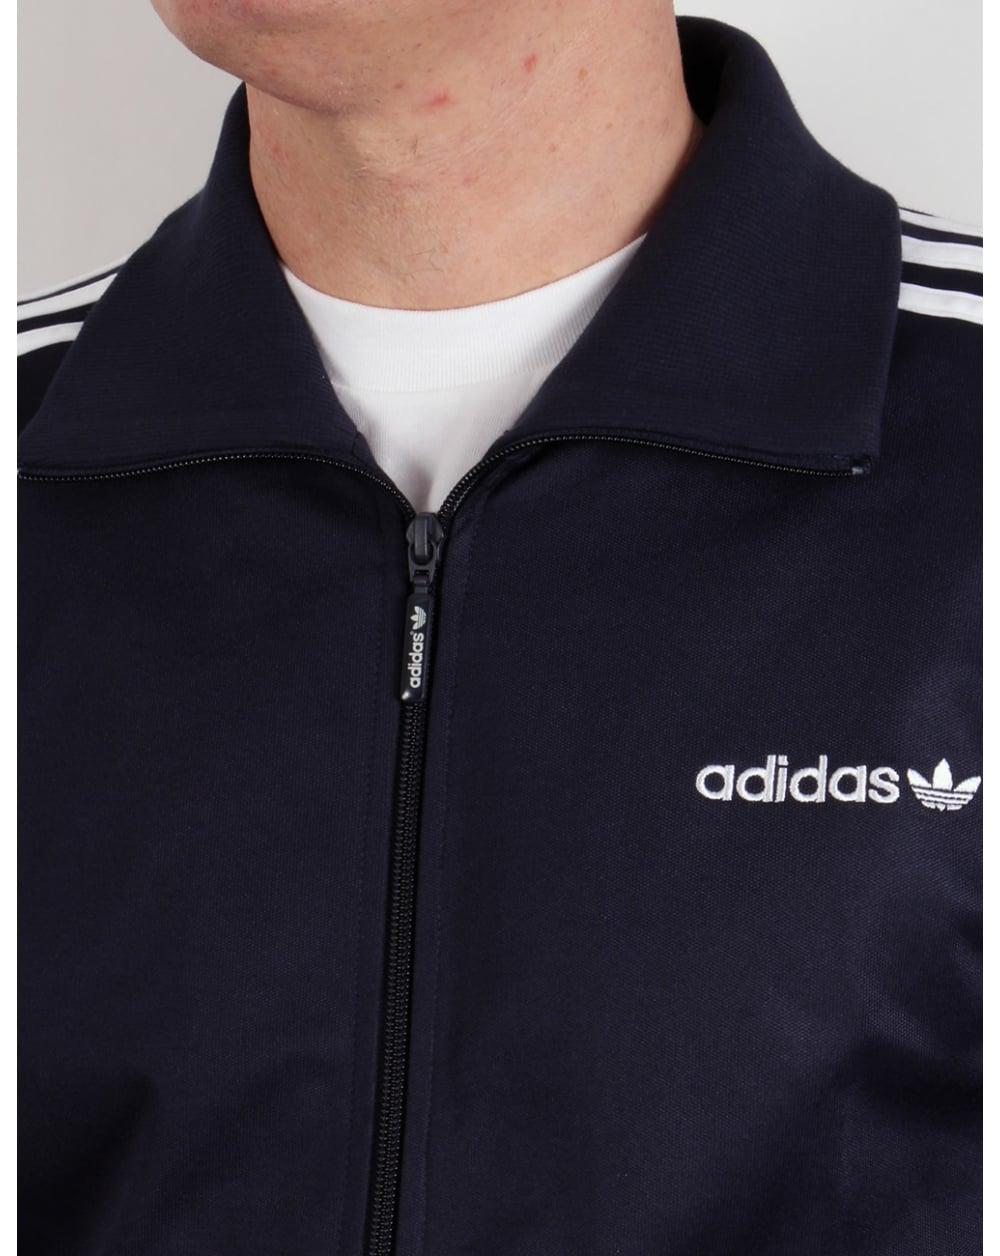 ffcd8350273c Adidas Originals Beckenbauer Track Top Navy Blue white - Adidas ...